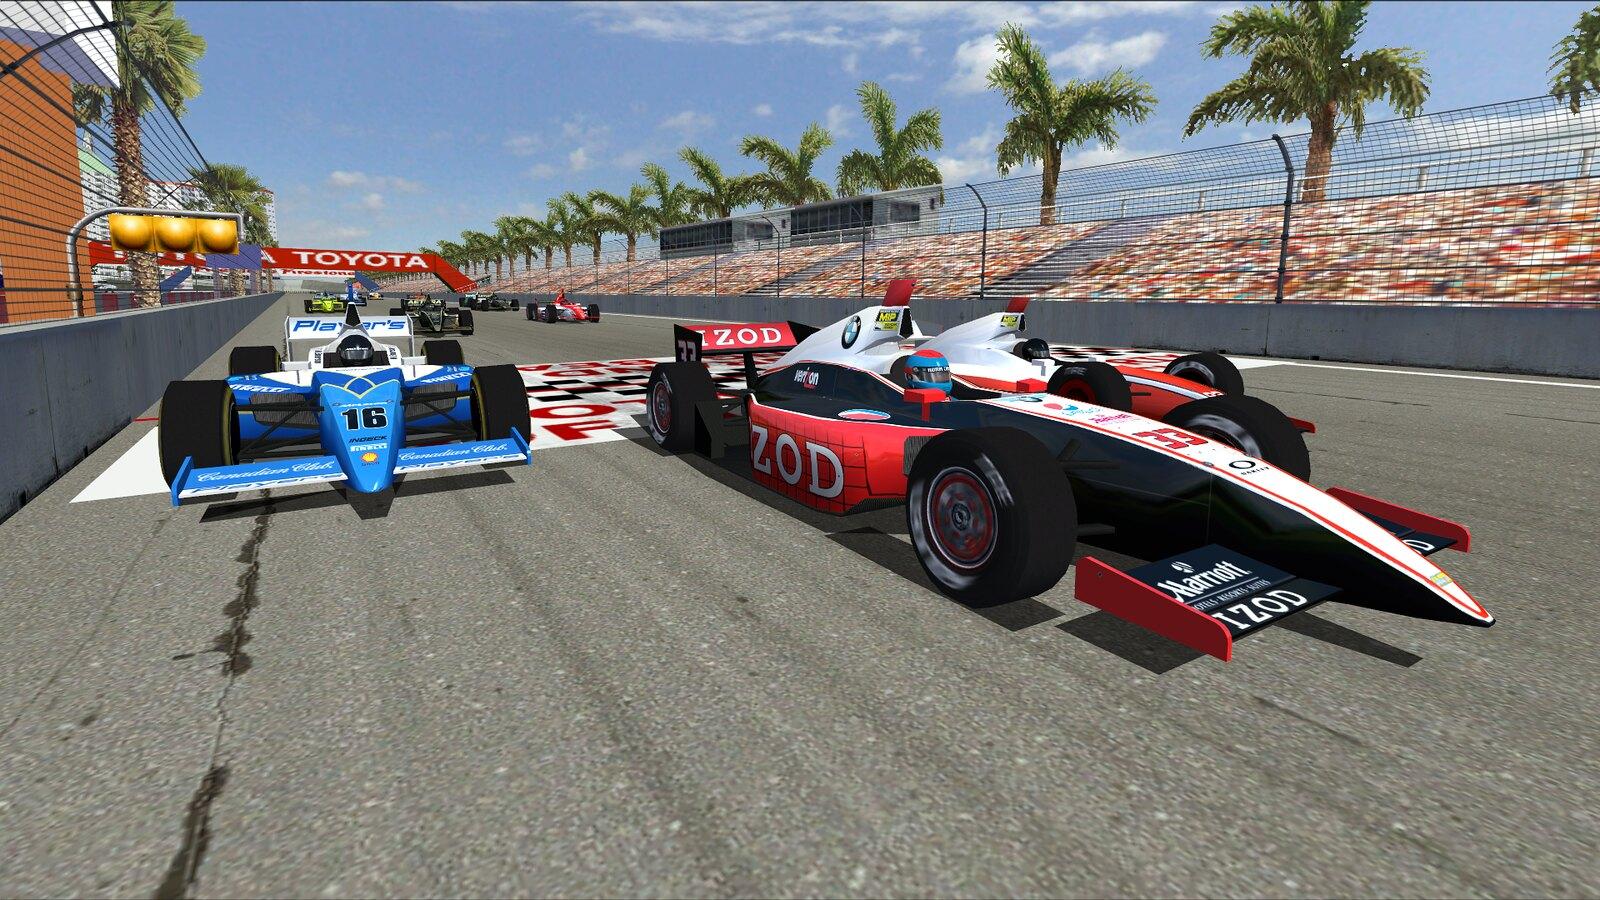 Lotus Grand Prix of Long Beach [33L] 7413263400_2d5ff2e29c_h